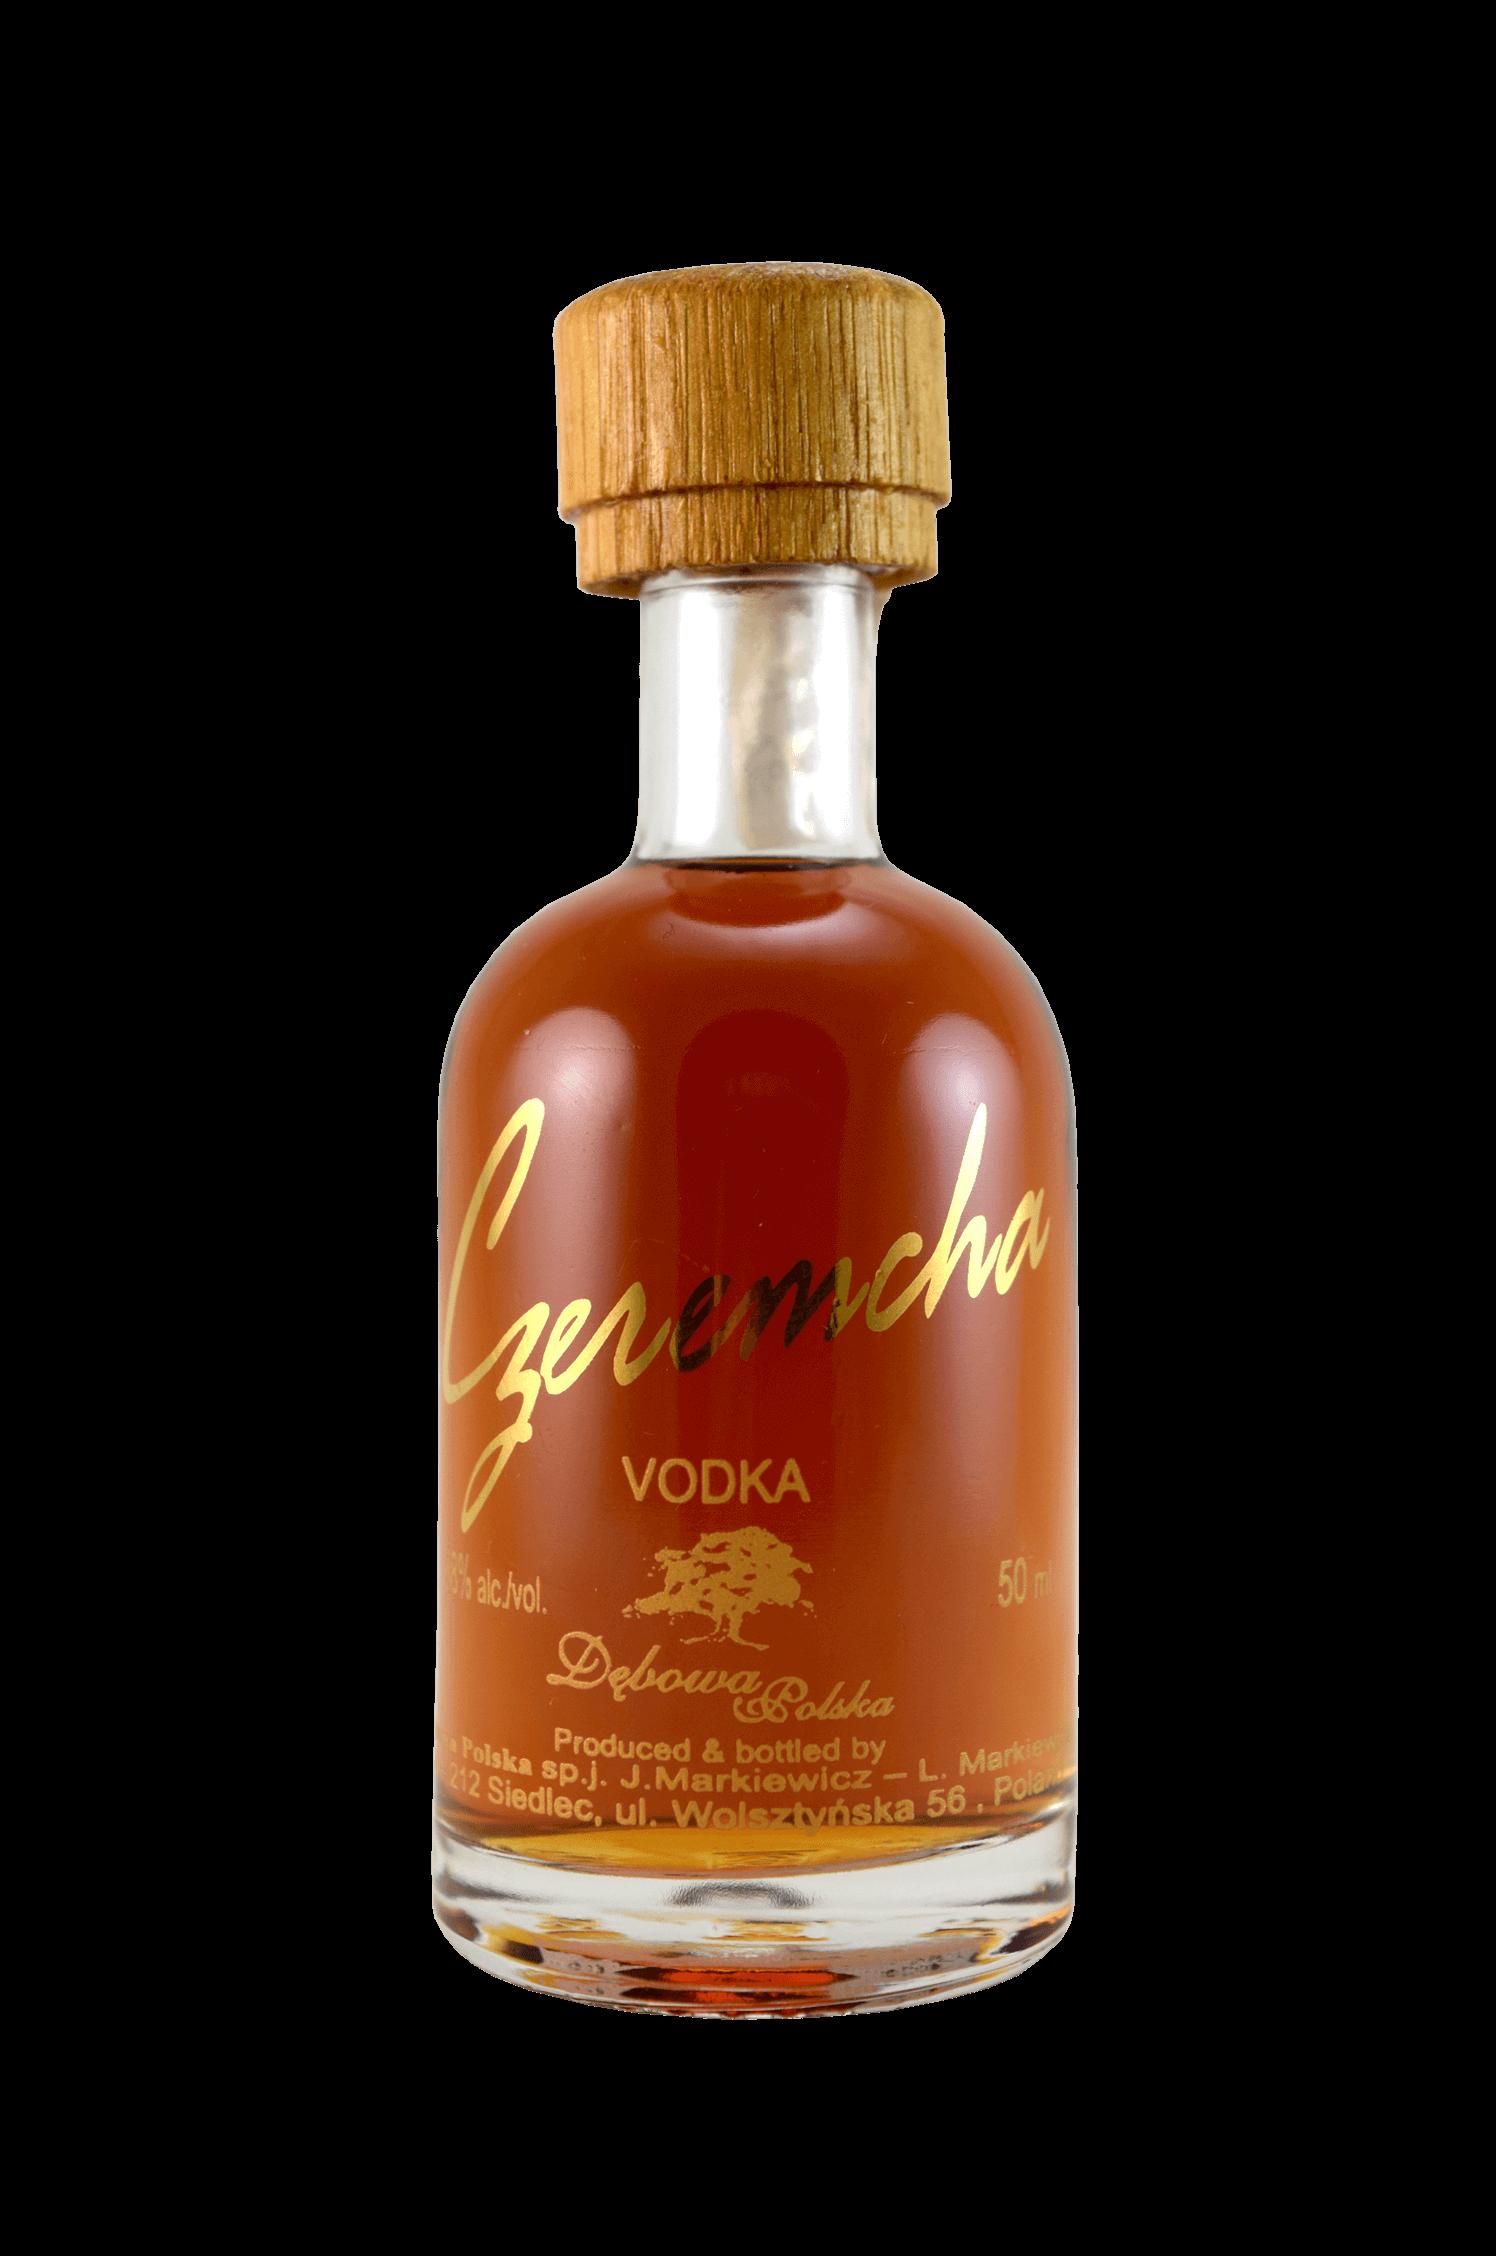 Debowa Czeremcha Vodka